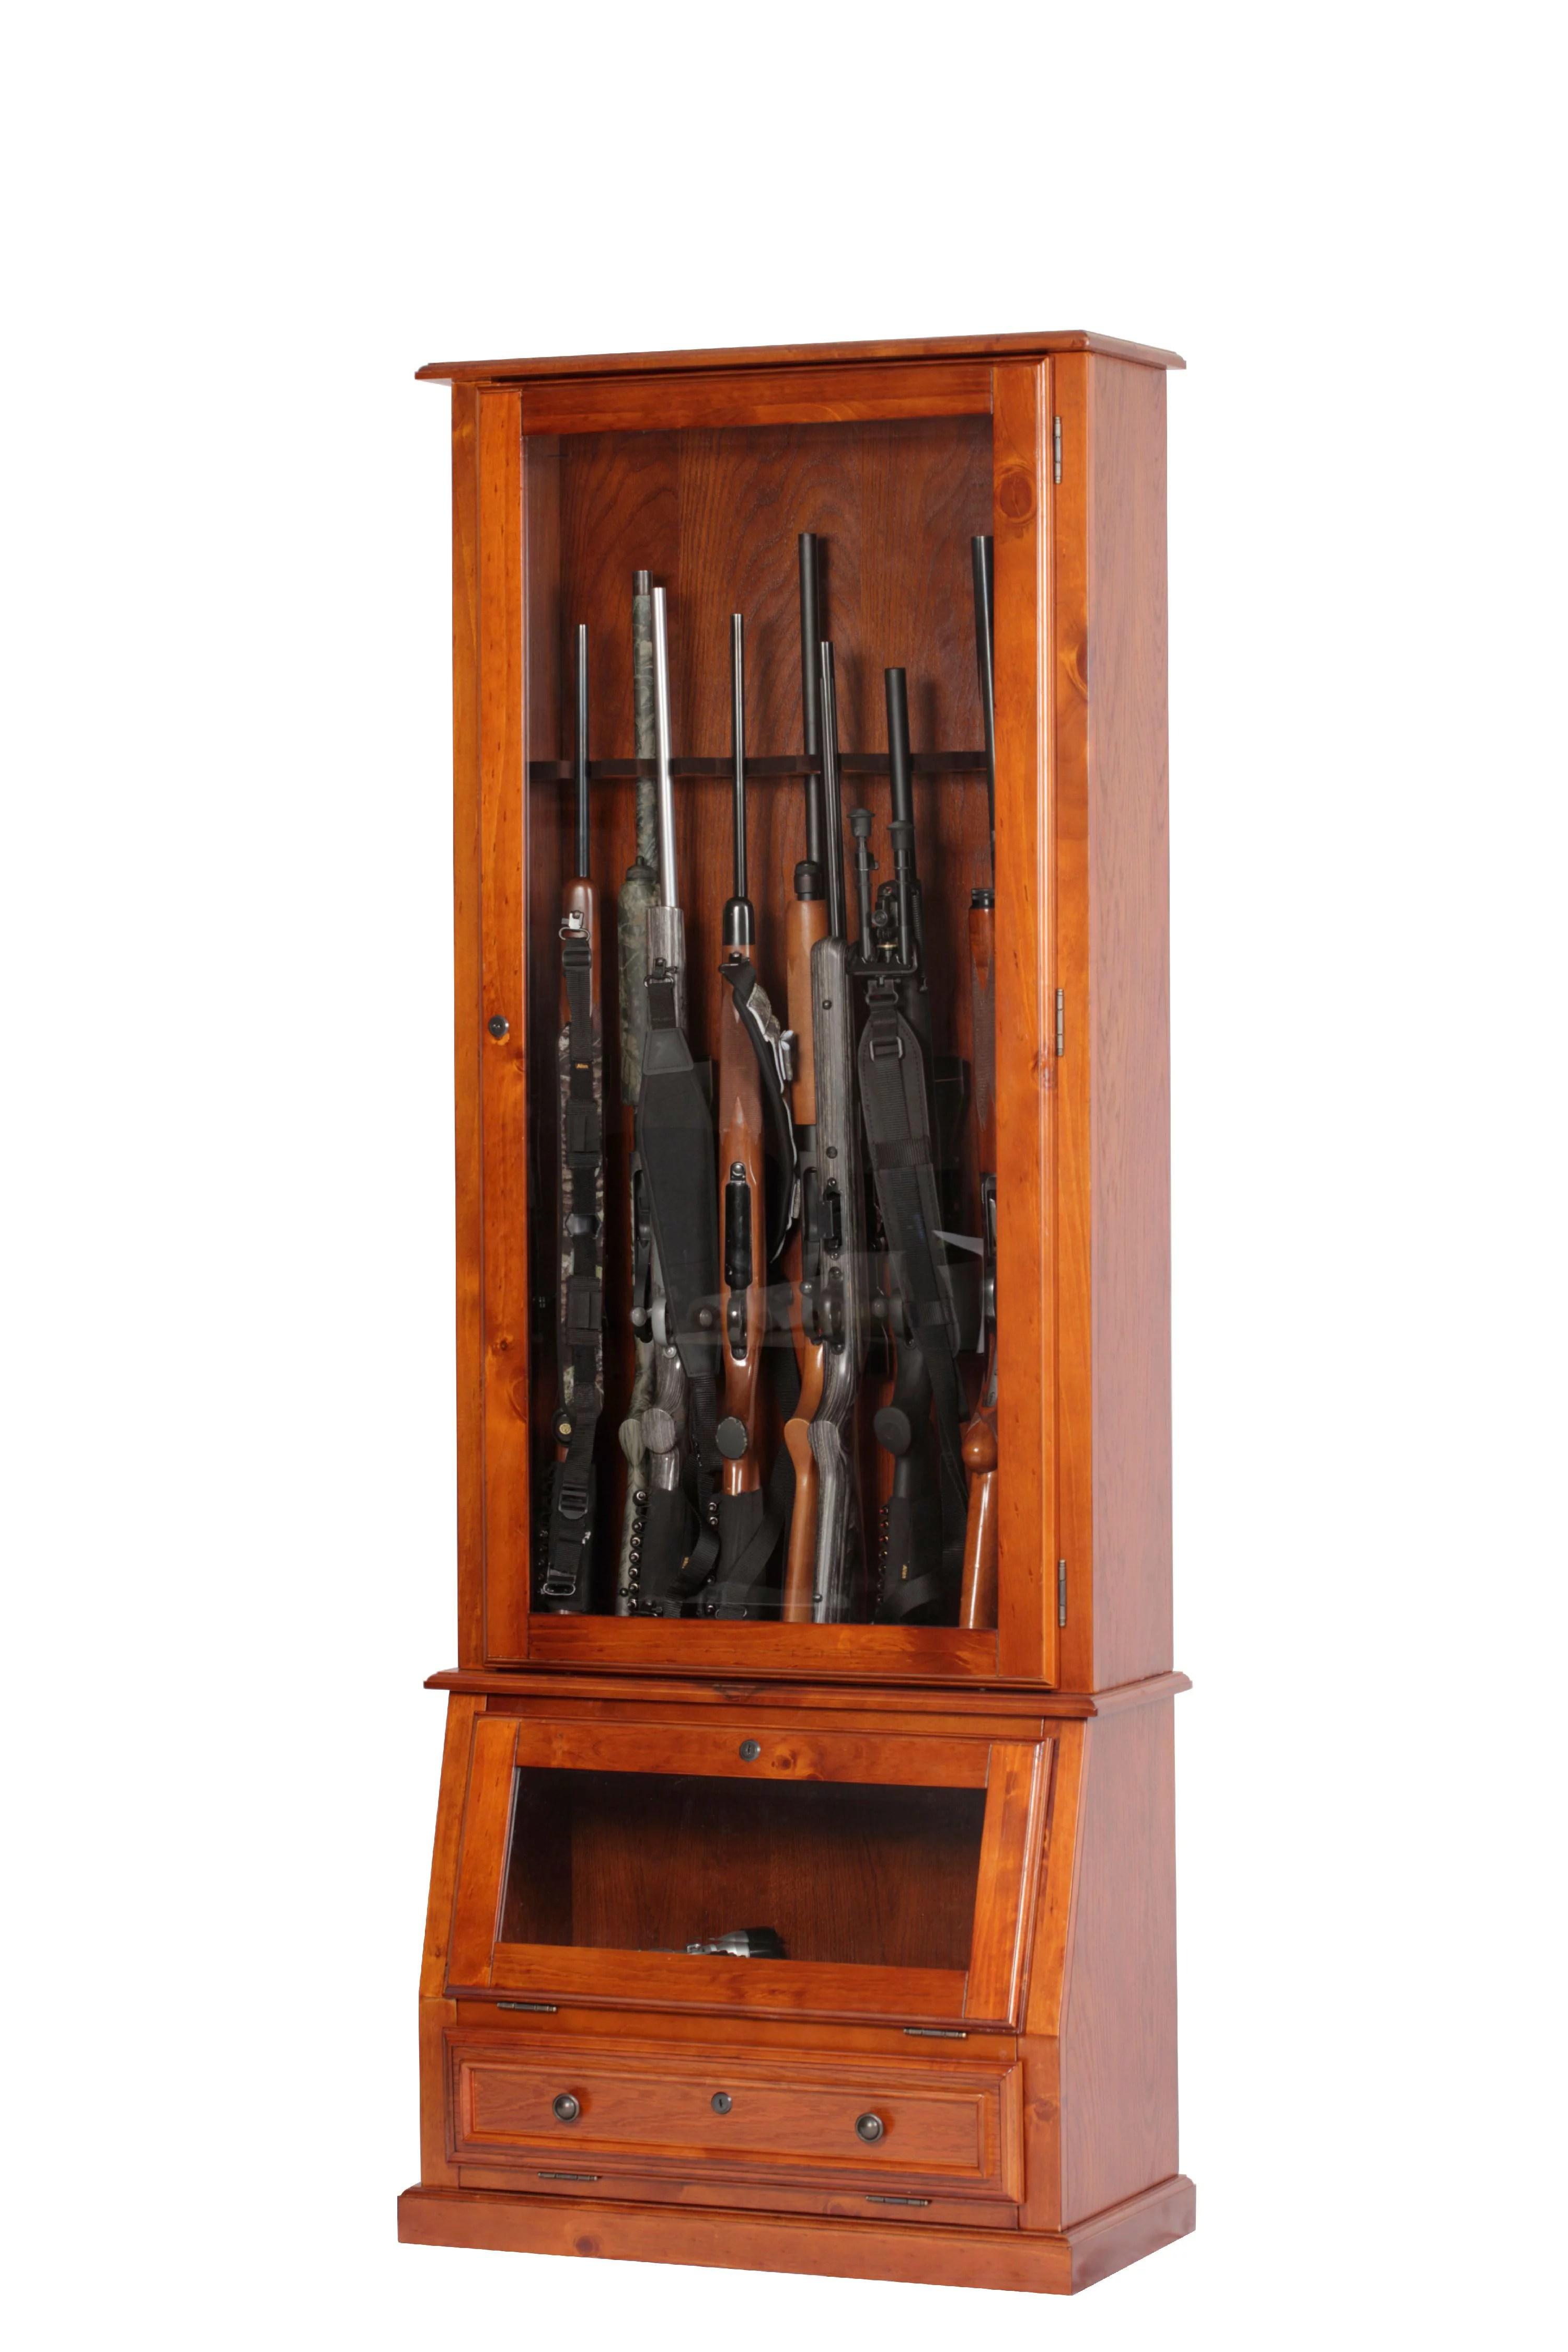 American Furniture Classics Rifle Shotgun And Pistol